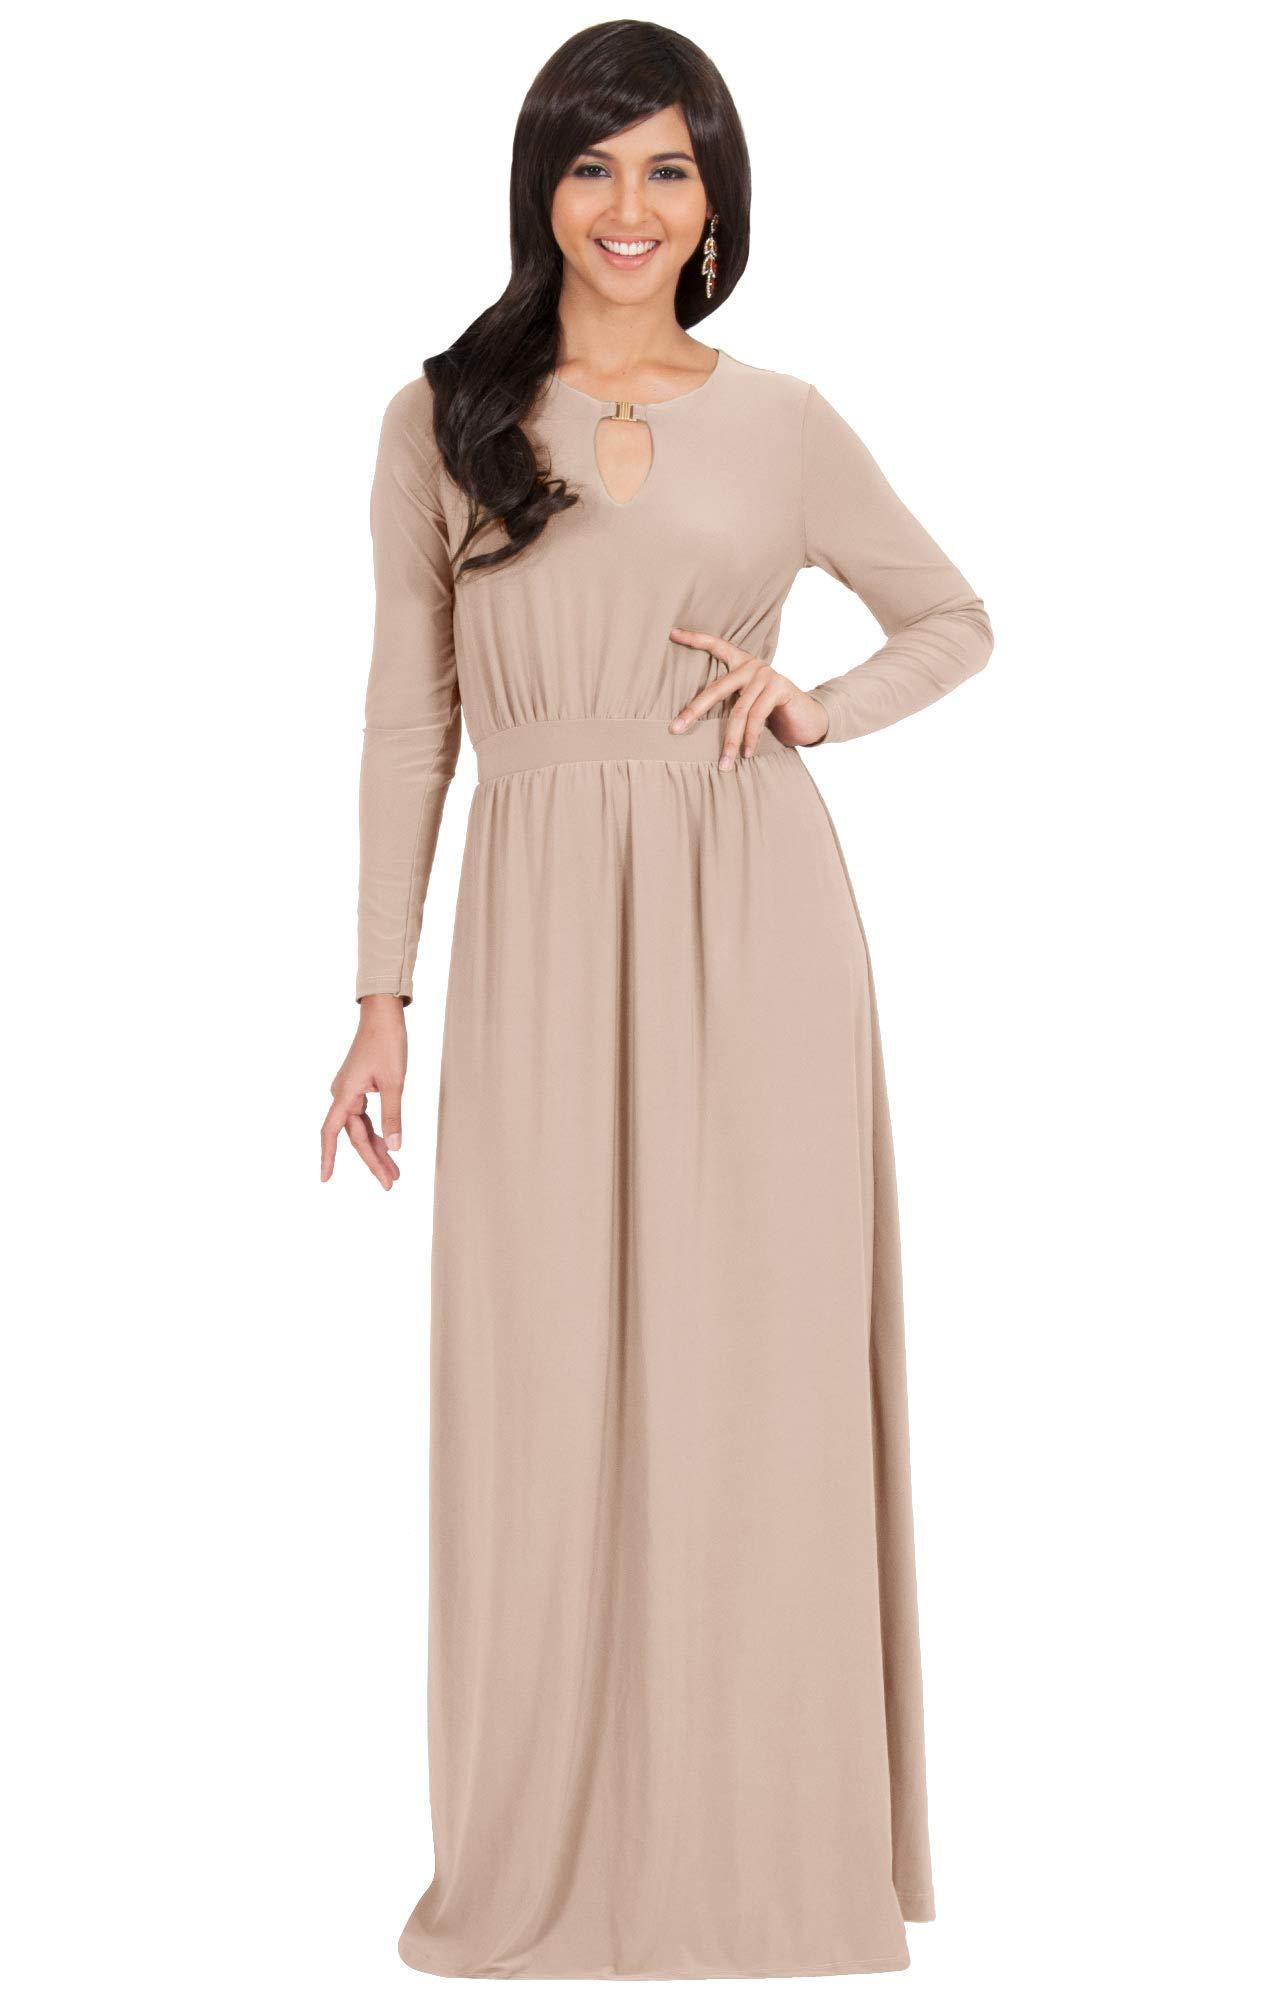 961ba67c5e6 KOH KOH Plus Size Womens Long Sleeve Sleeves Modest Flowy Fall Winter  Formal Empire Waist Evening Day Work Casual Abaya Muslim Wedding Gown Gowns  Maxi Dress ...